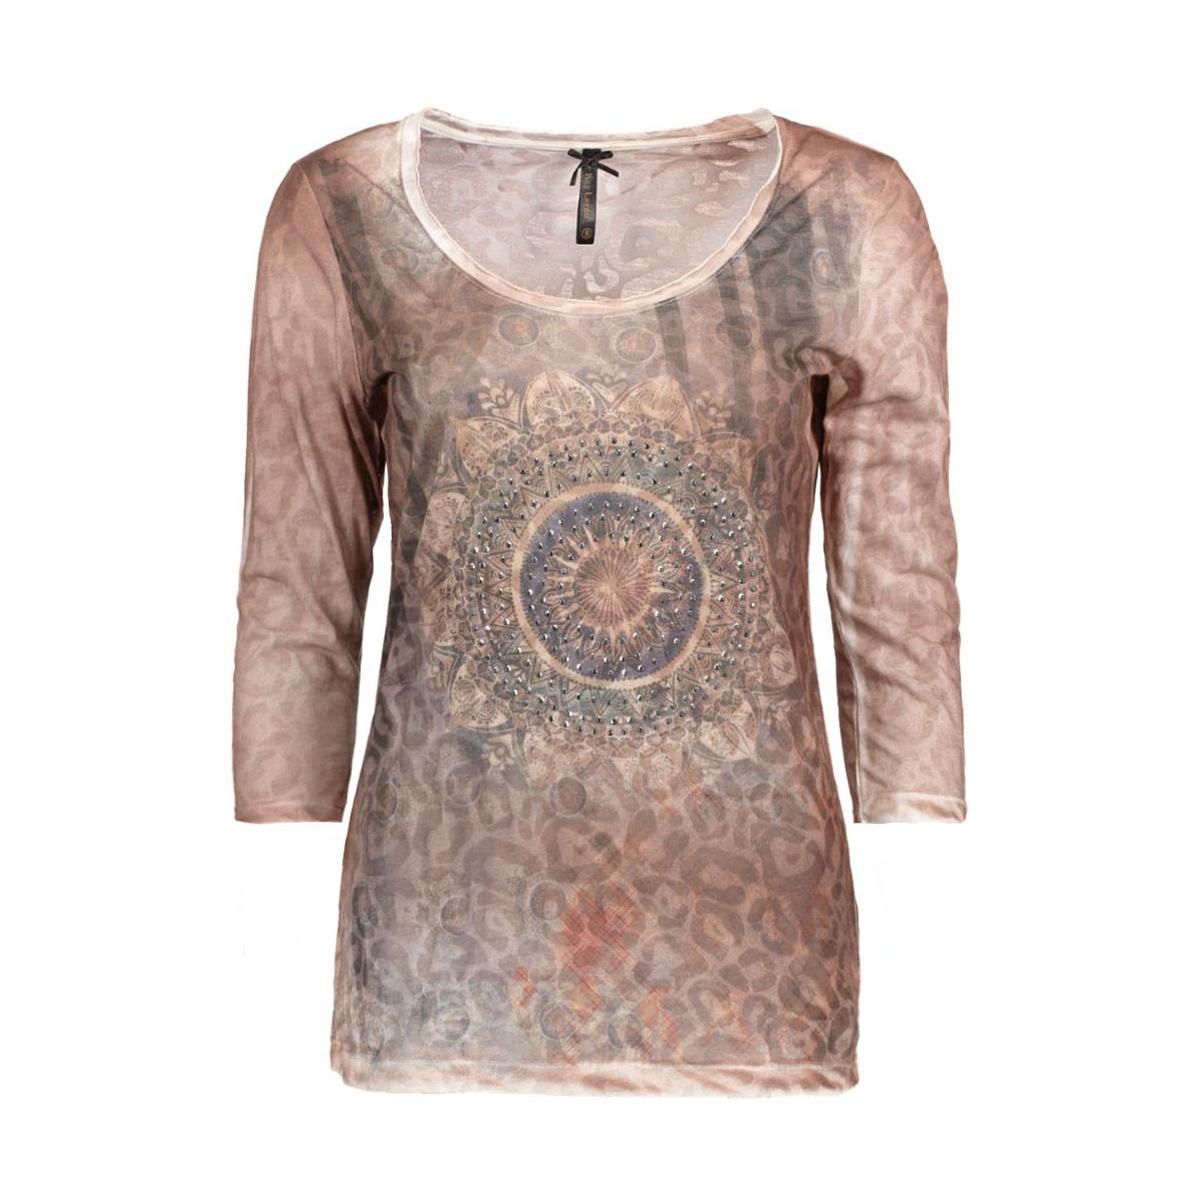 dls00242 key largo t-shirt rose